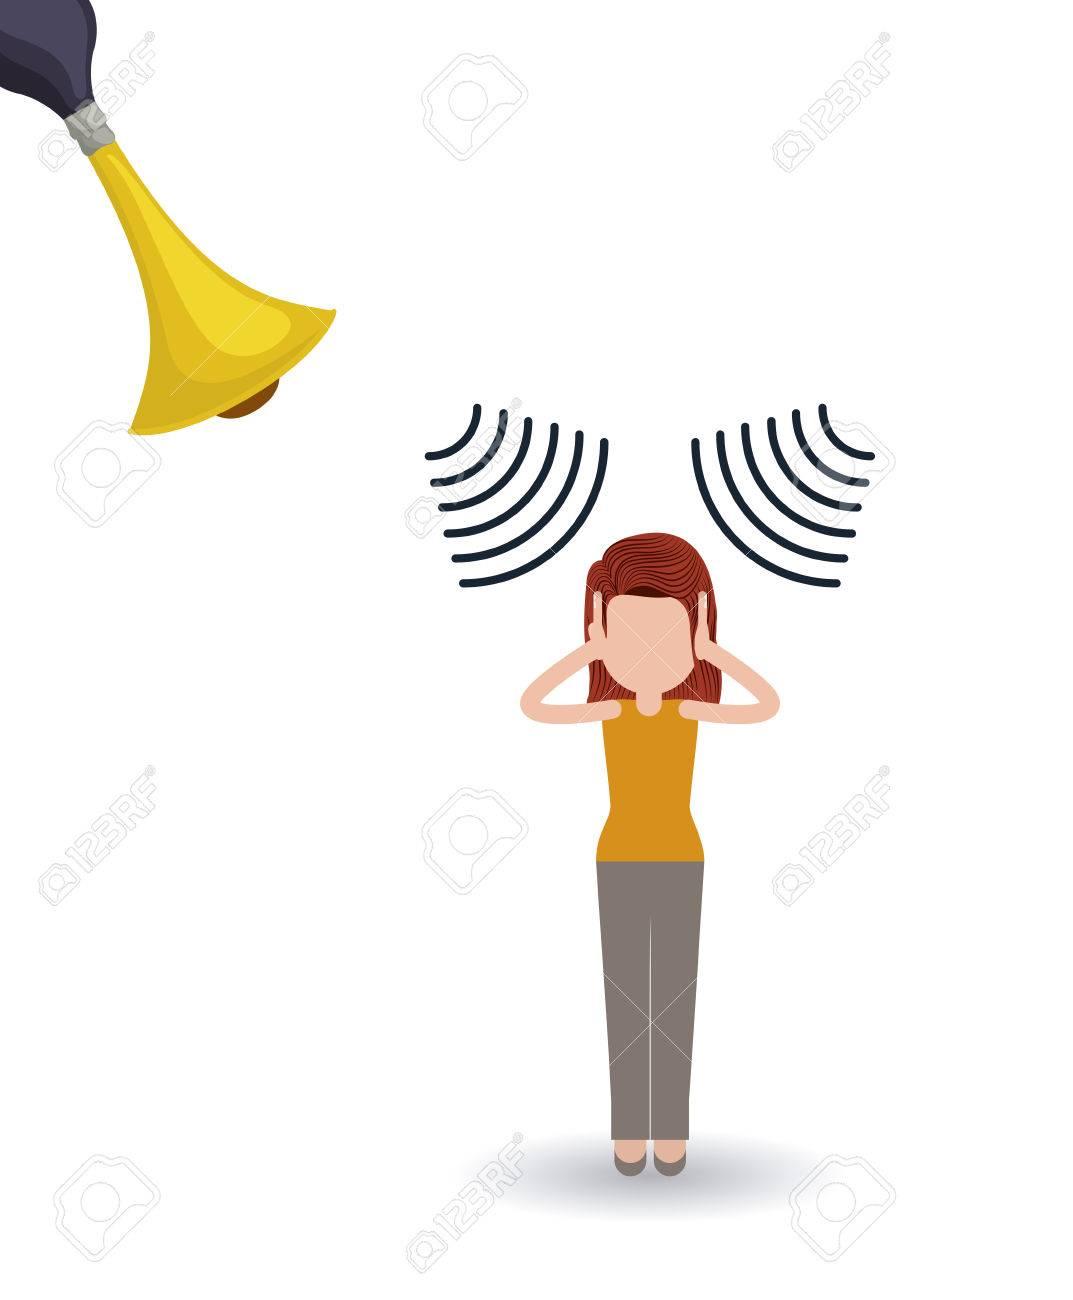 noise pollution design, vector illustration graphic - 53273646